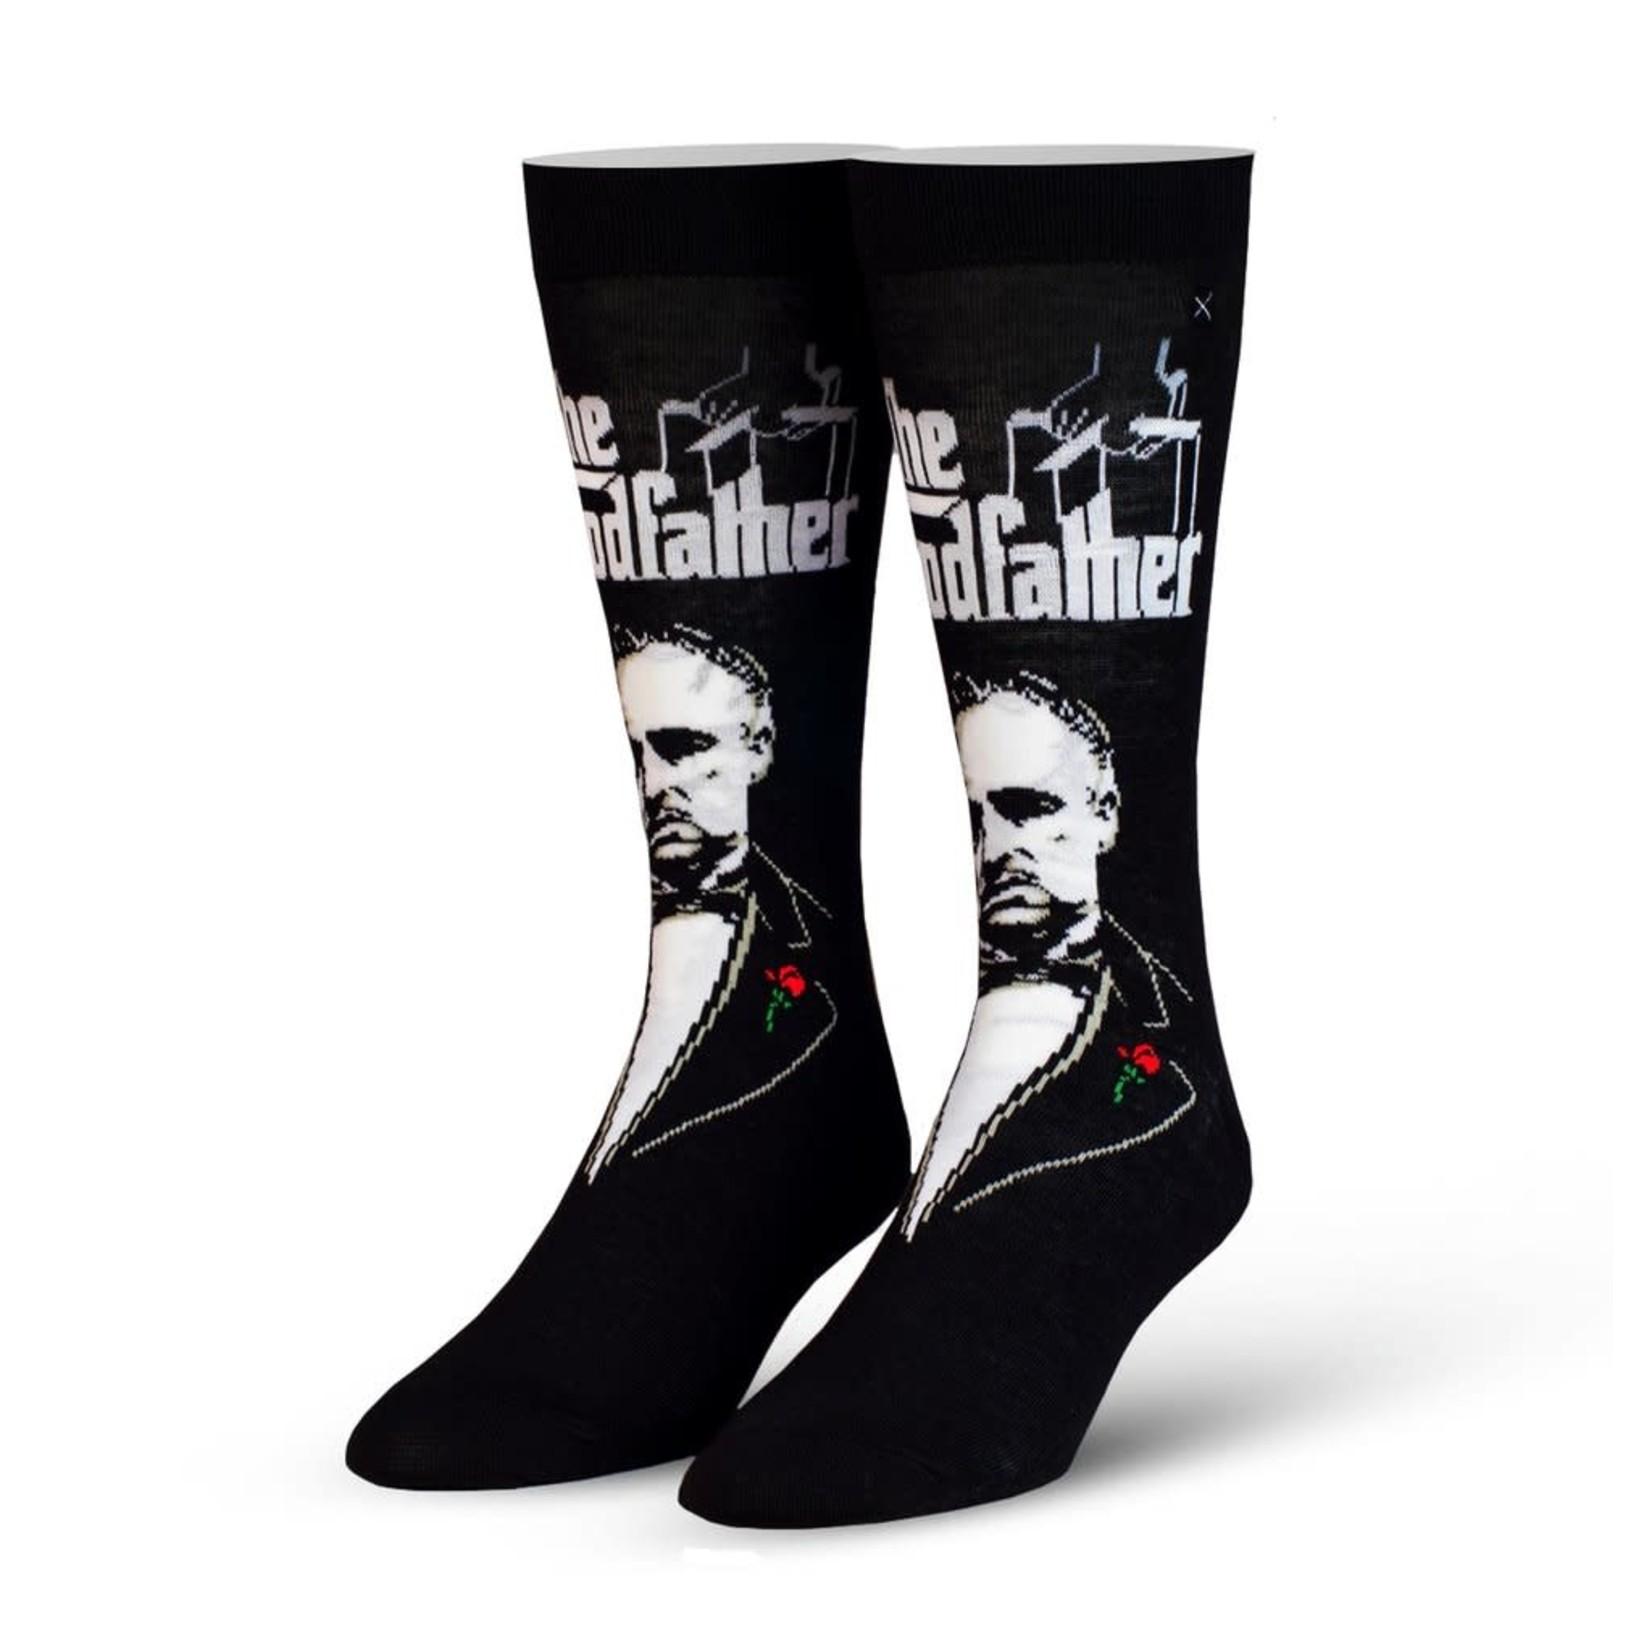 Socks (Unisex) - The Godfather Vito